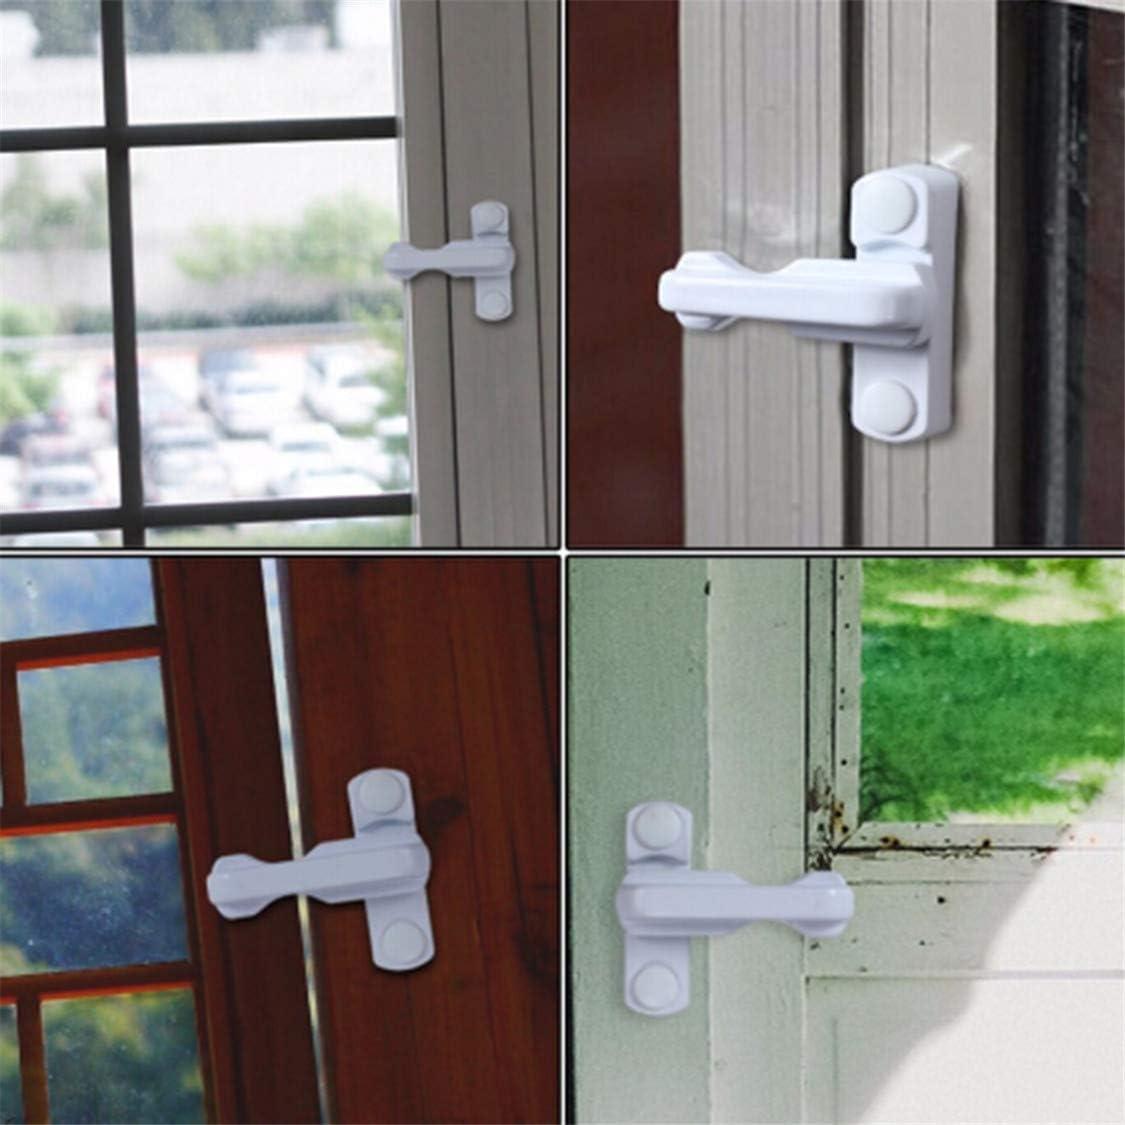 Idiytip Handed White Double Glazed Window Handles Security Child Baby Safety Proof Door Window Locks Restrictor Catch